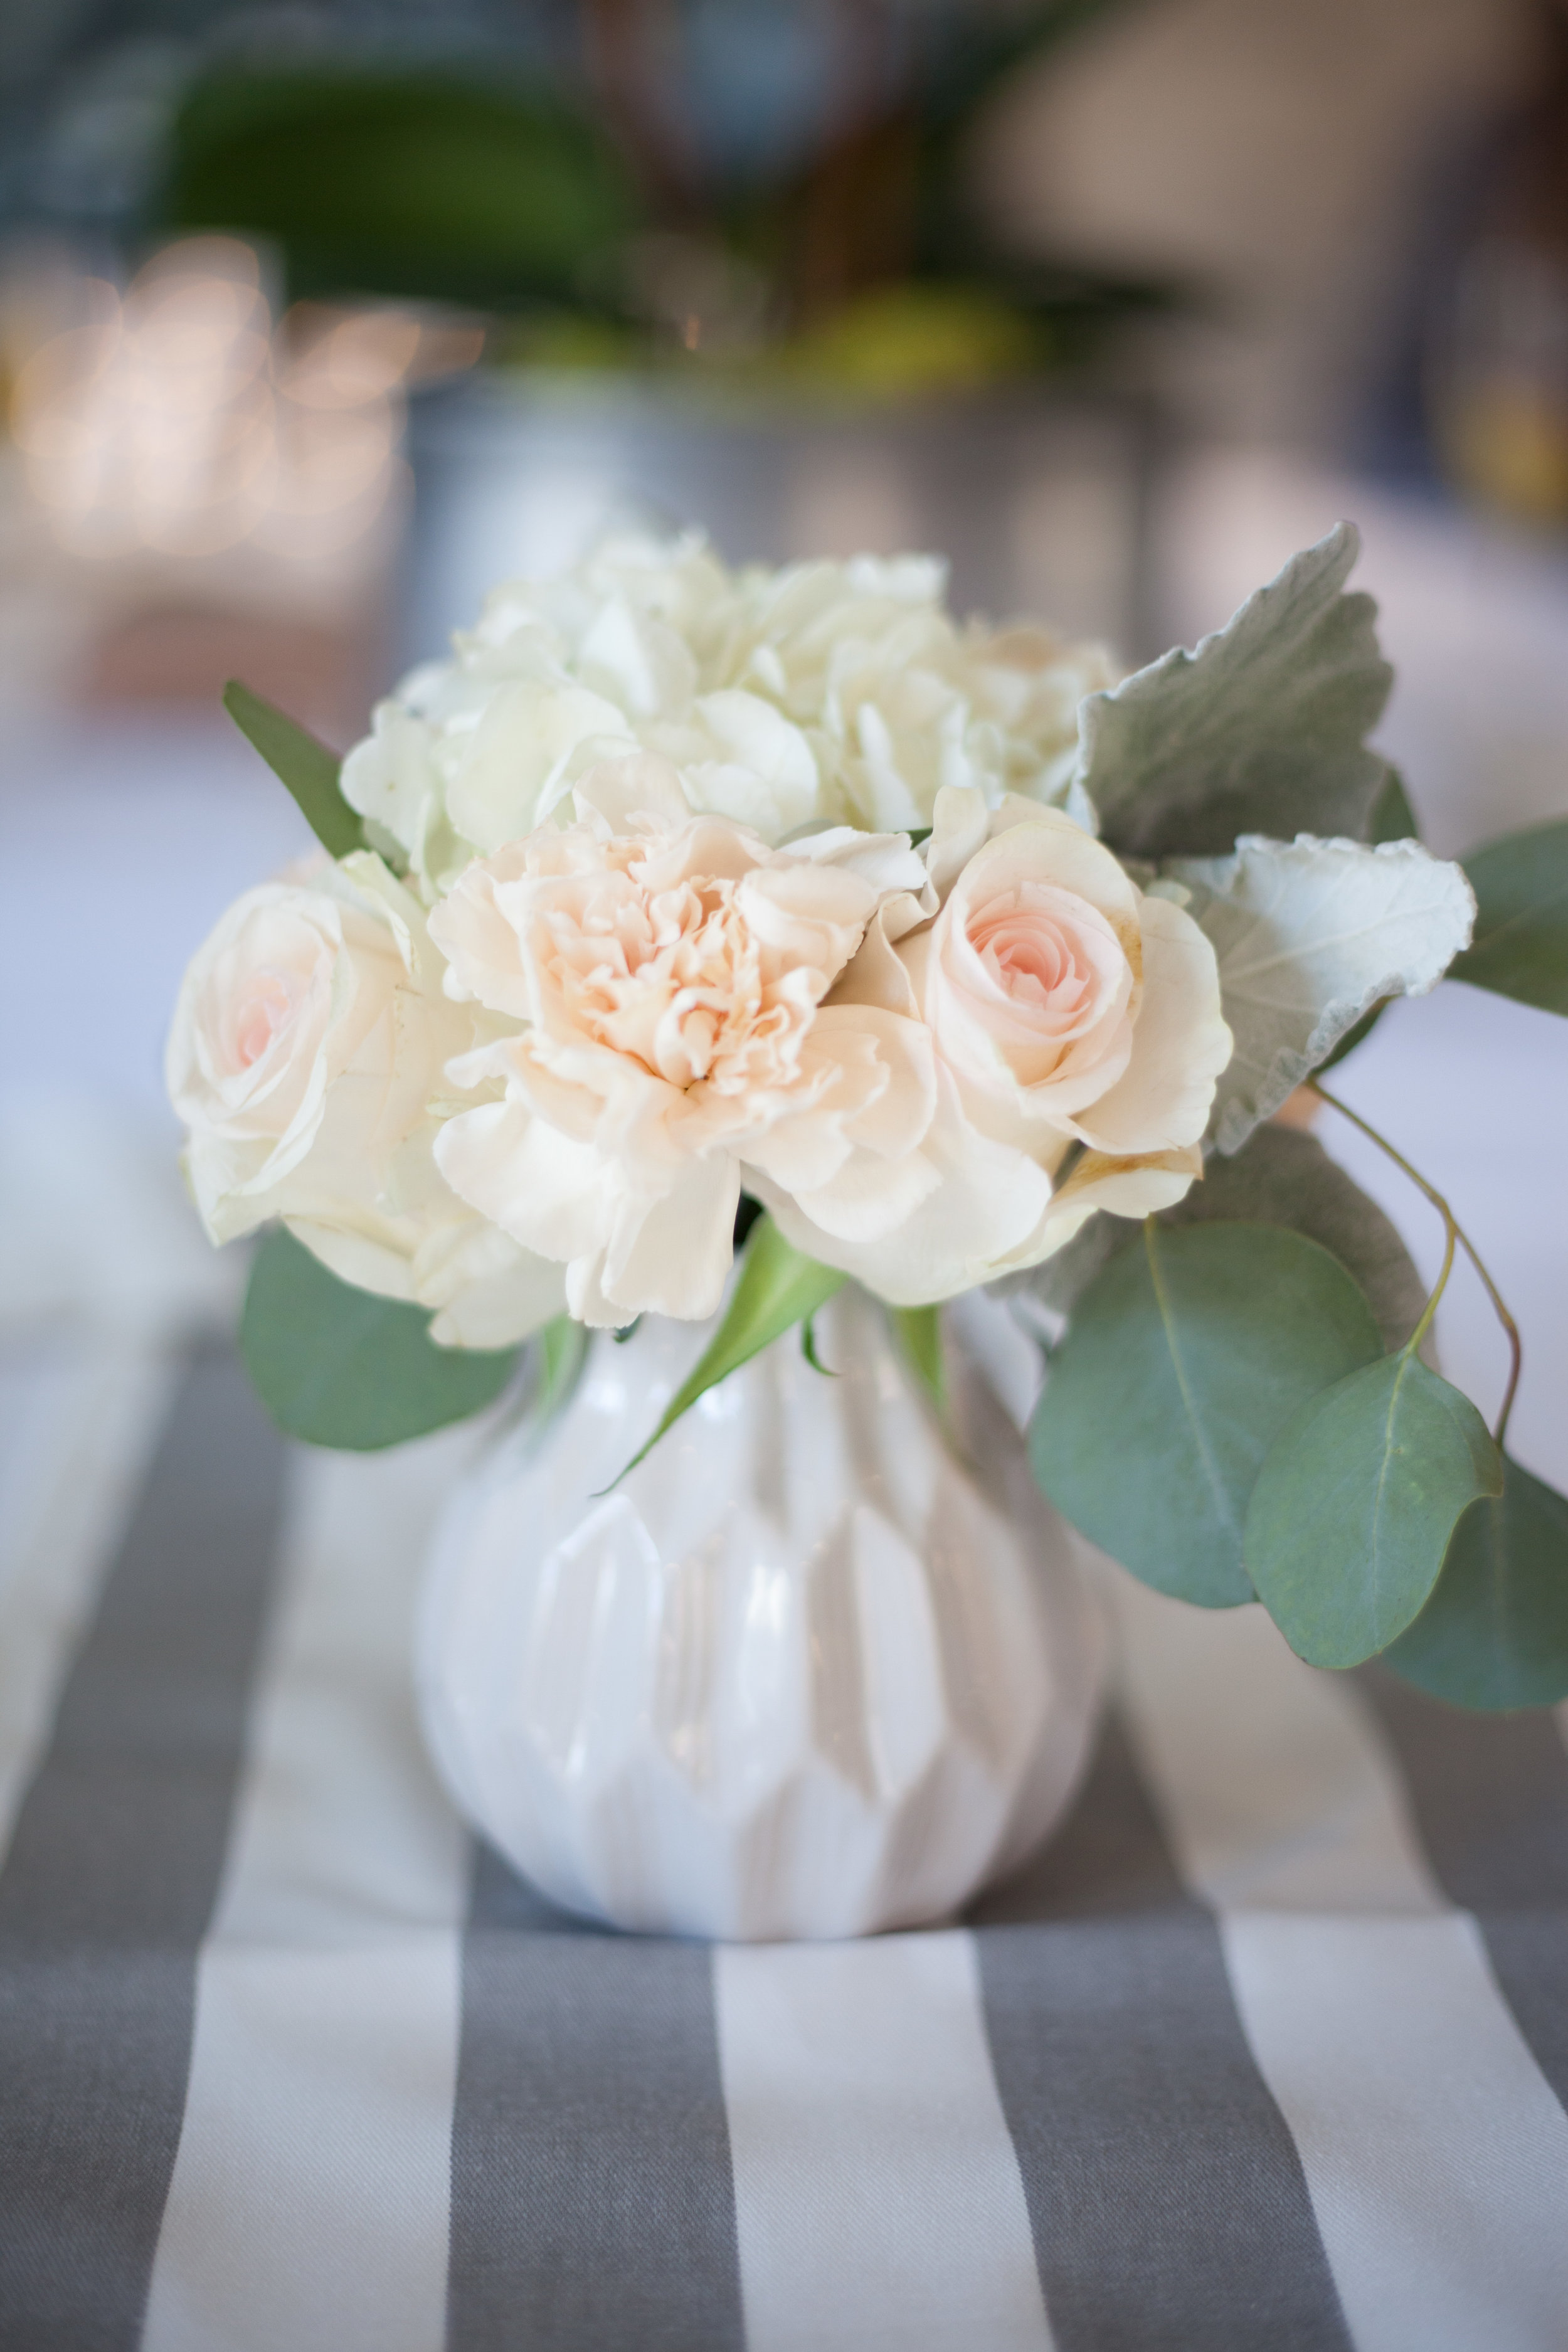 Mini Geometric White Vases